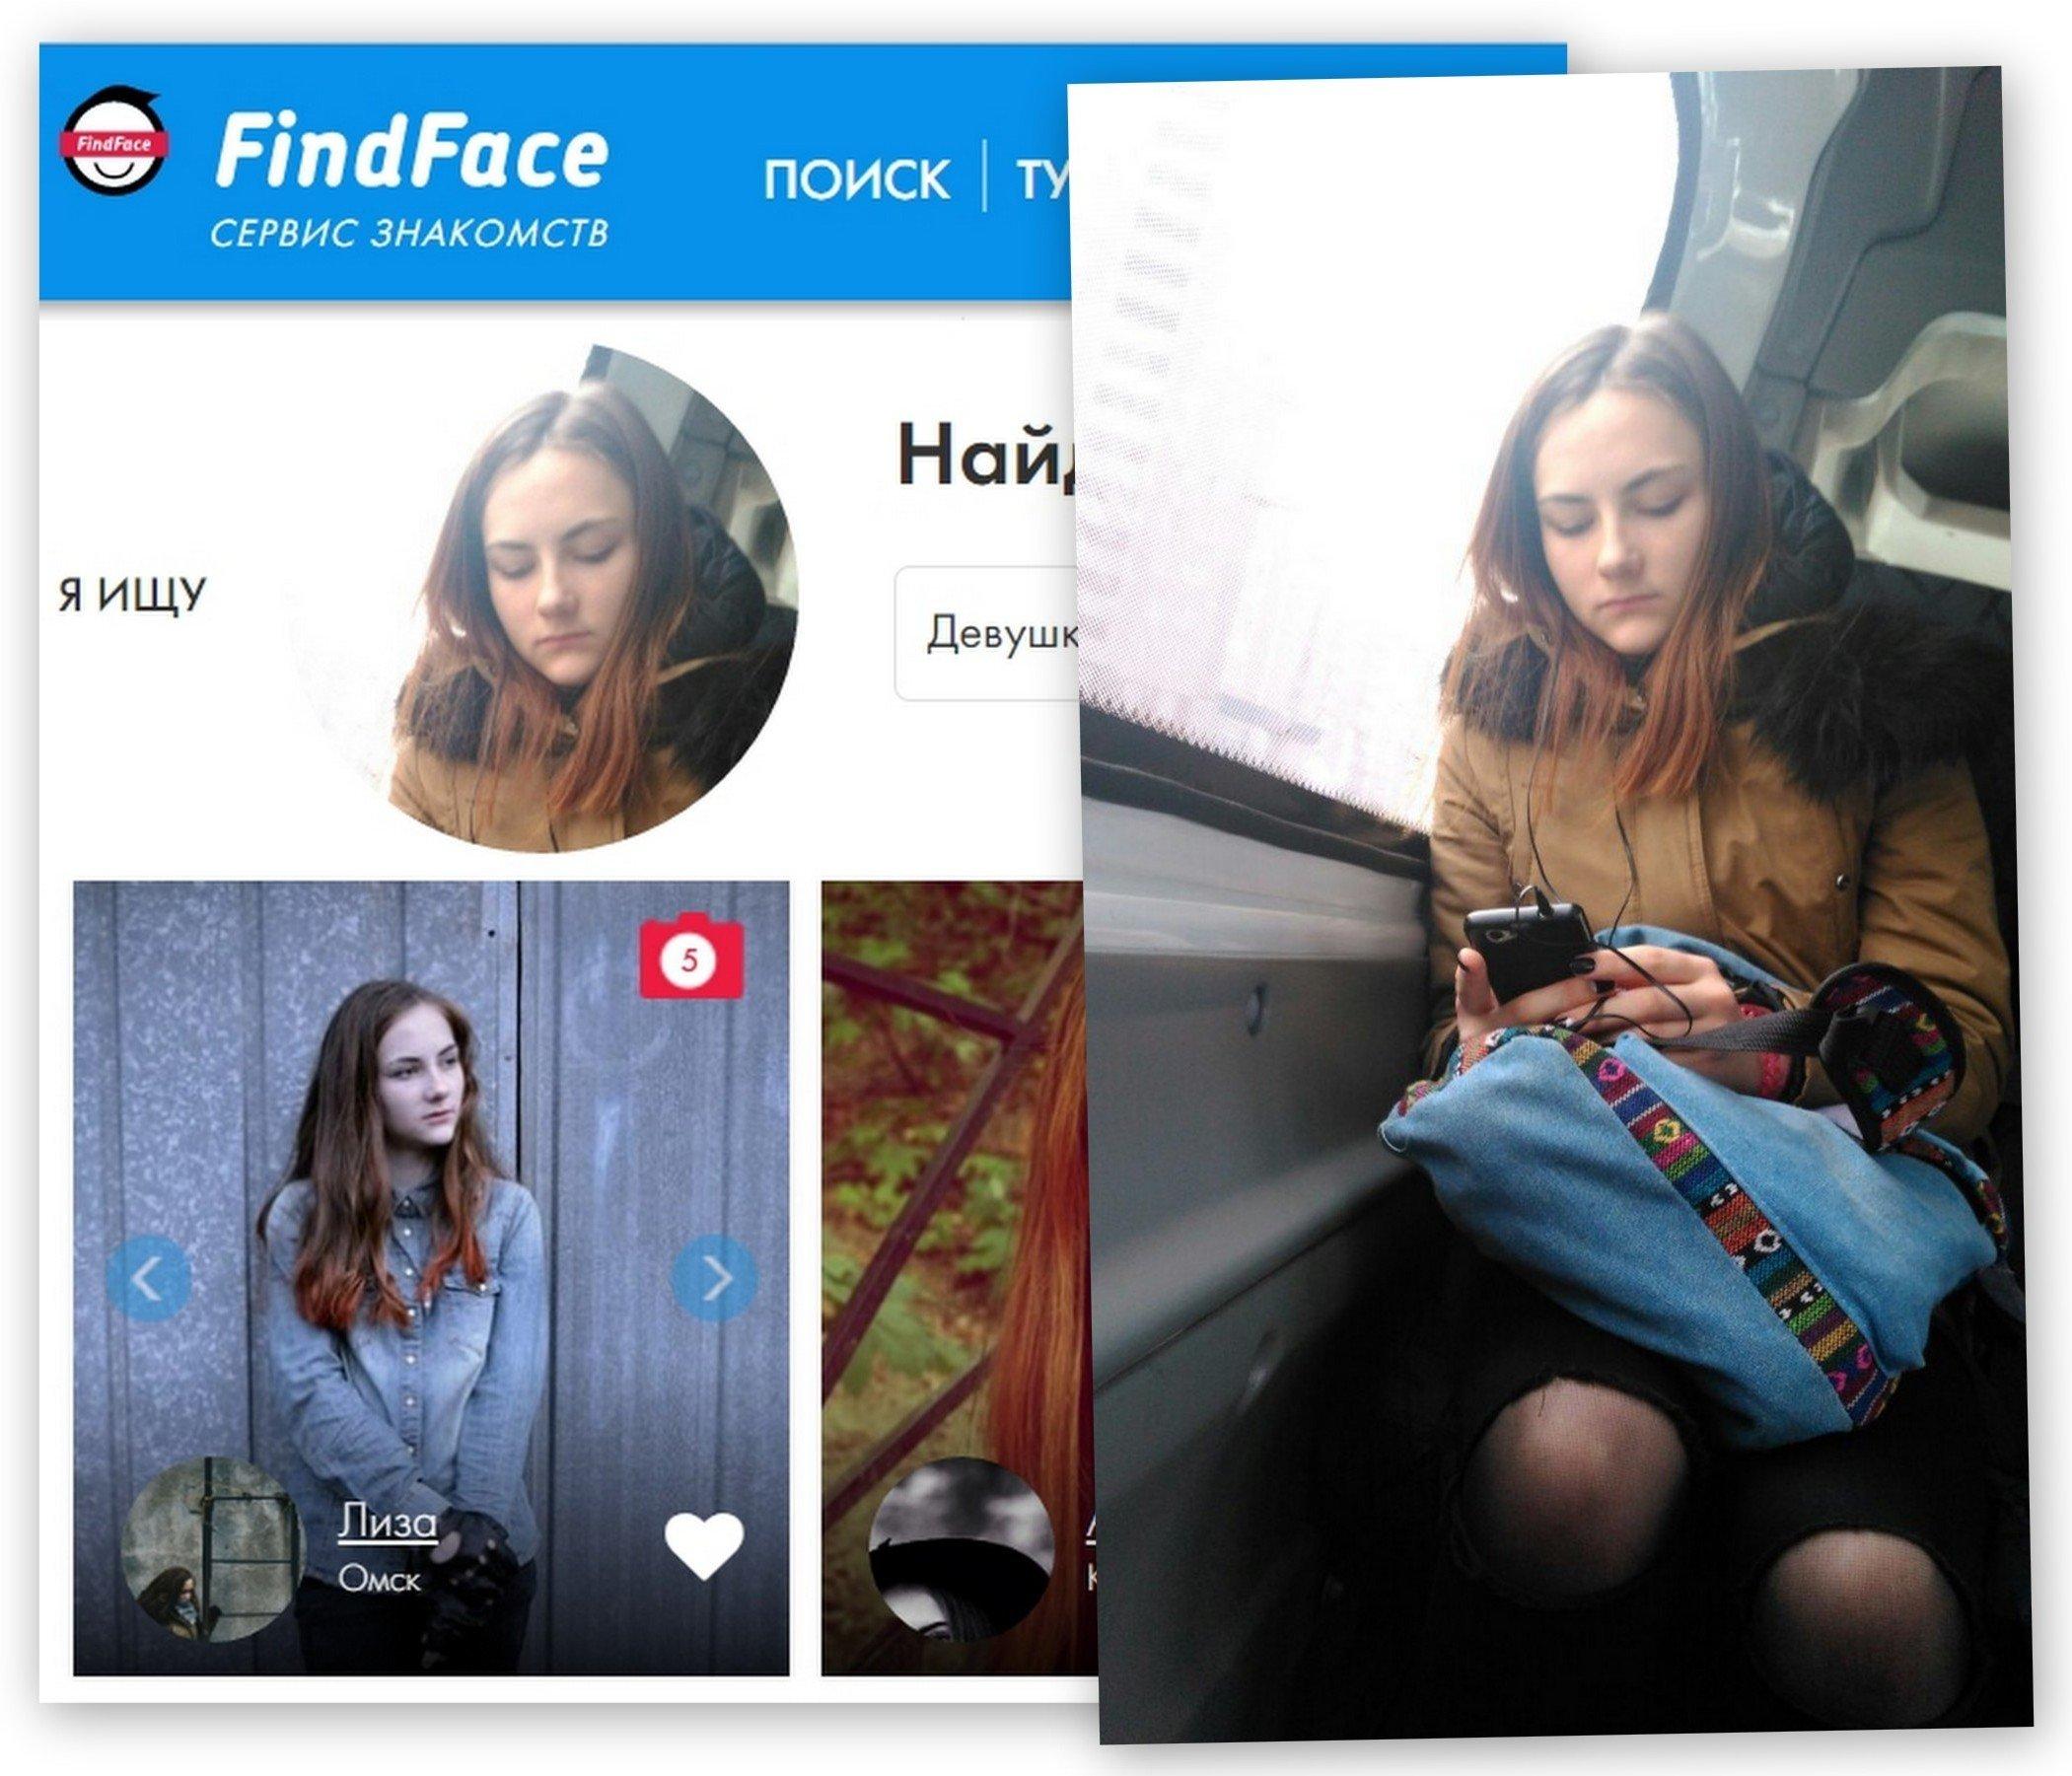 Сервис знакомств FindFace объявил озакрытии